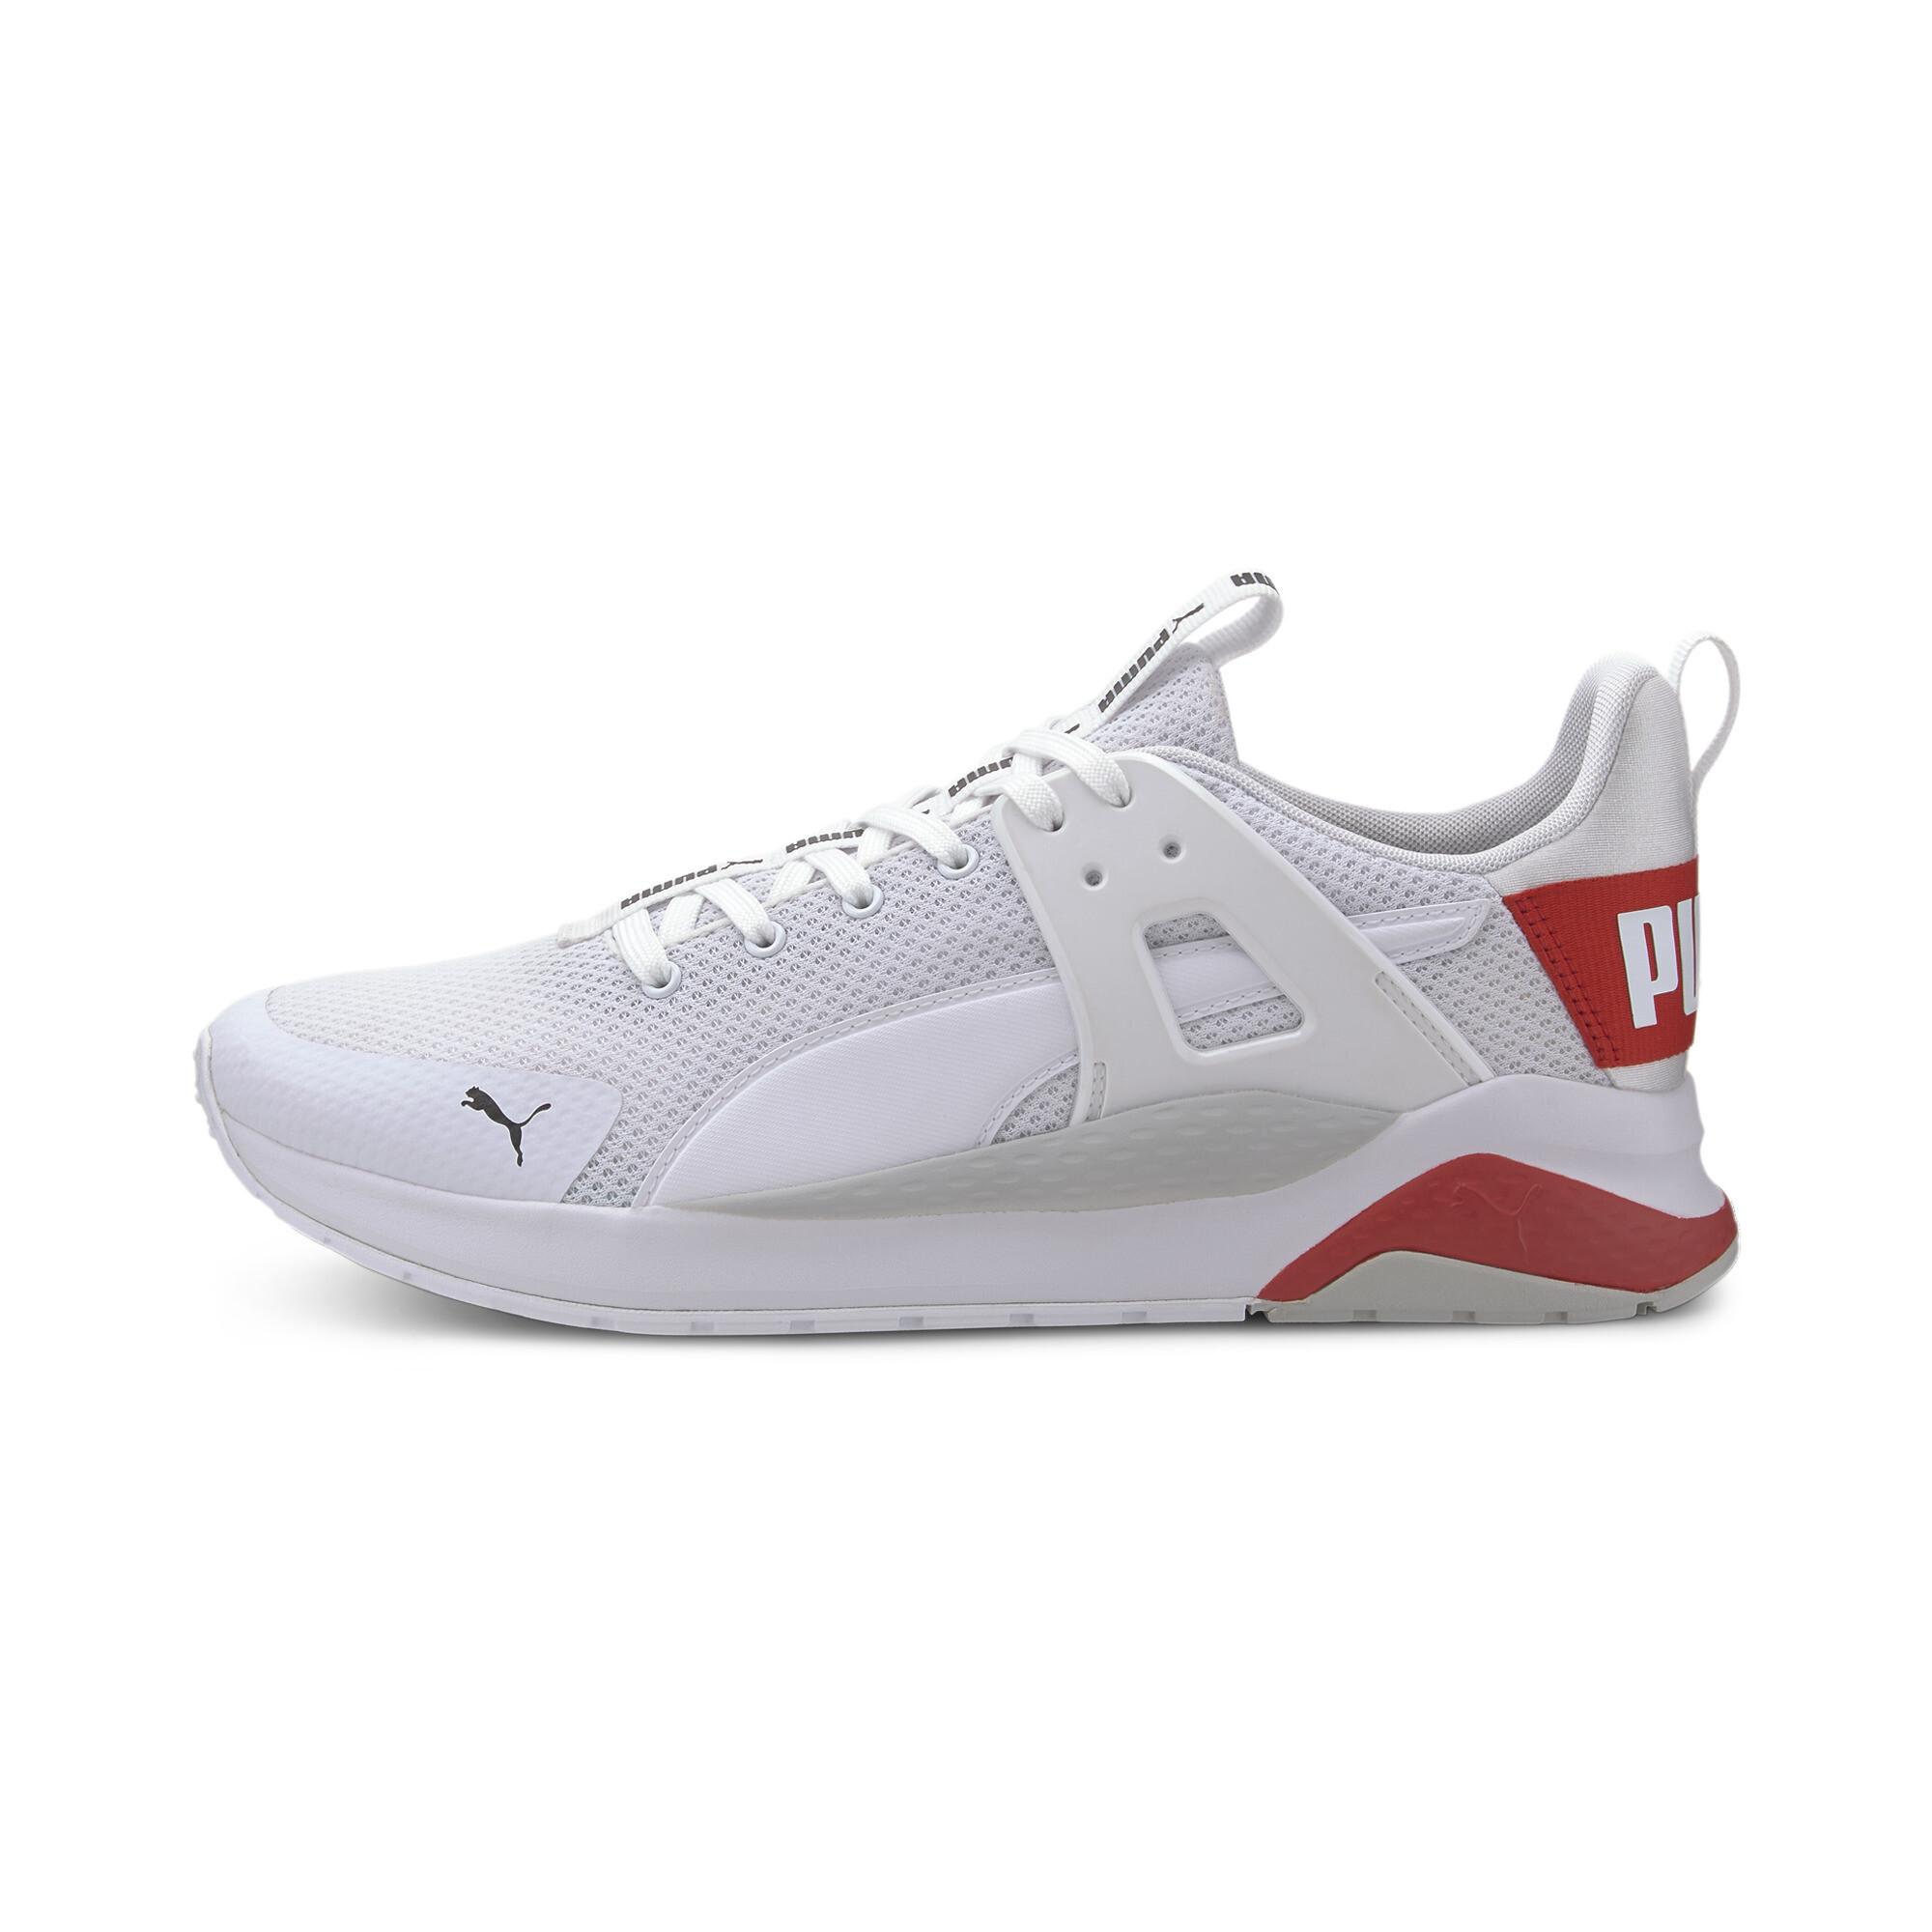 thumbnail 17 - PUMA-Men-039-s-Anzarun-Cage-Sneakers